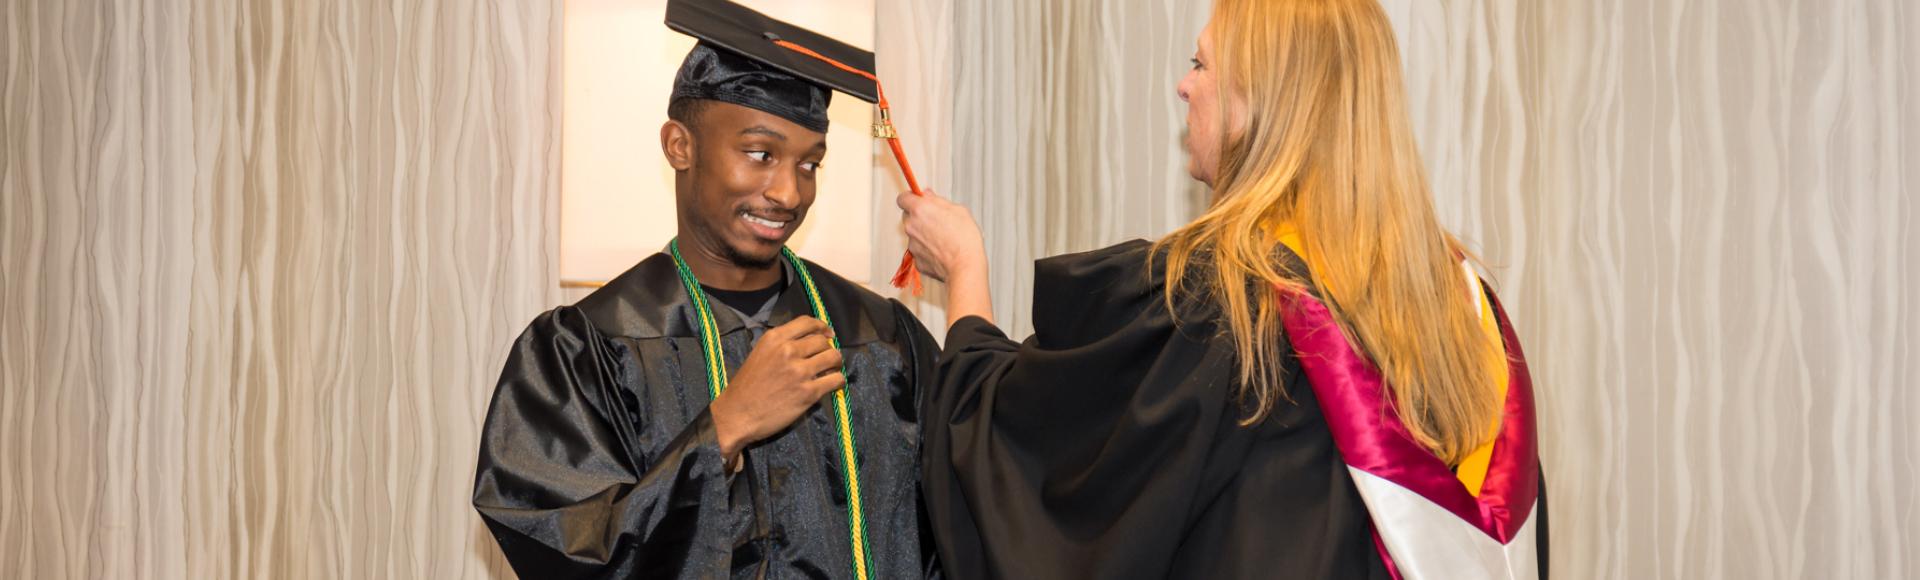 News & Updates at PVG Graduation Photography